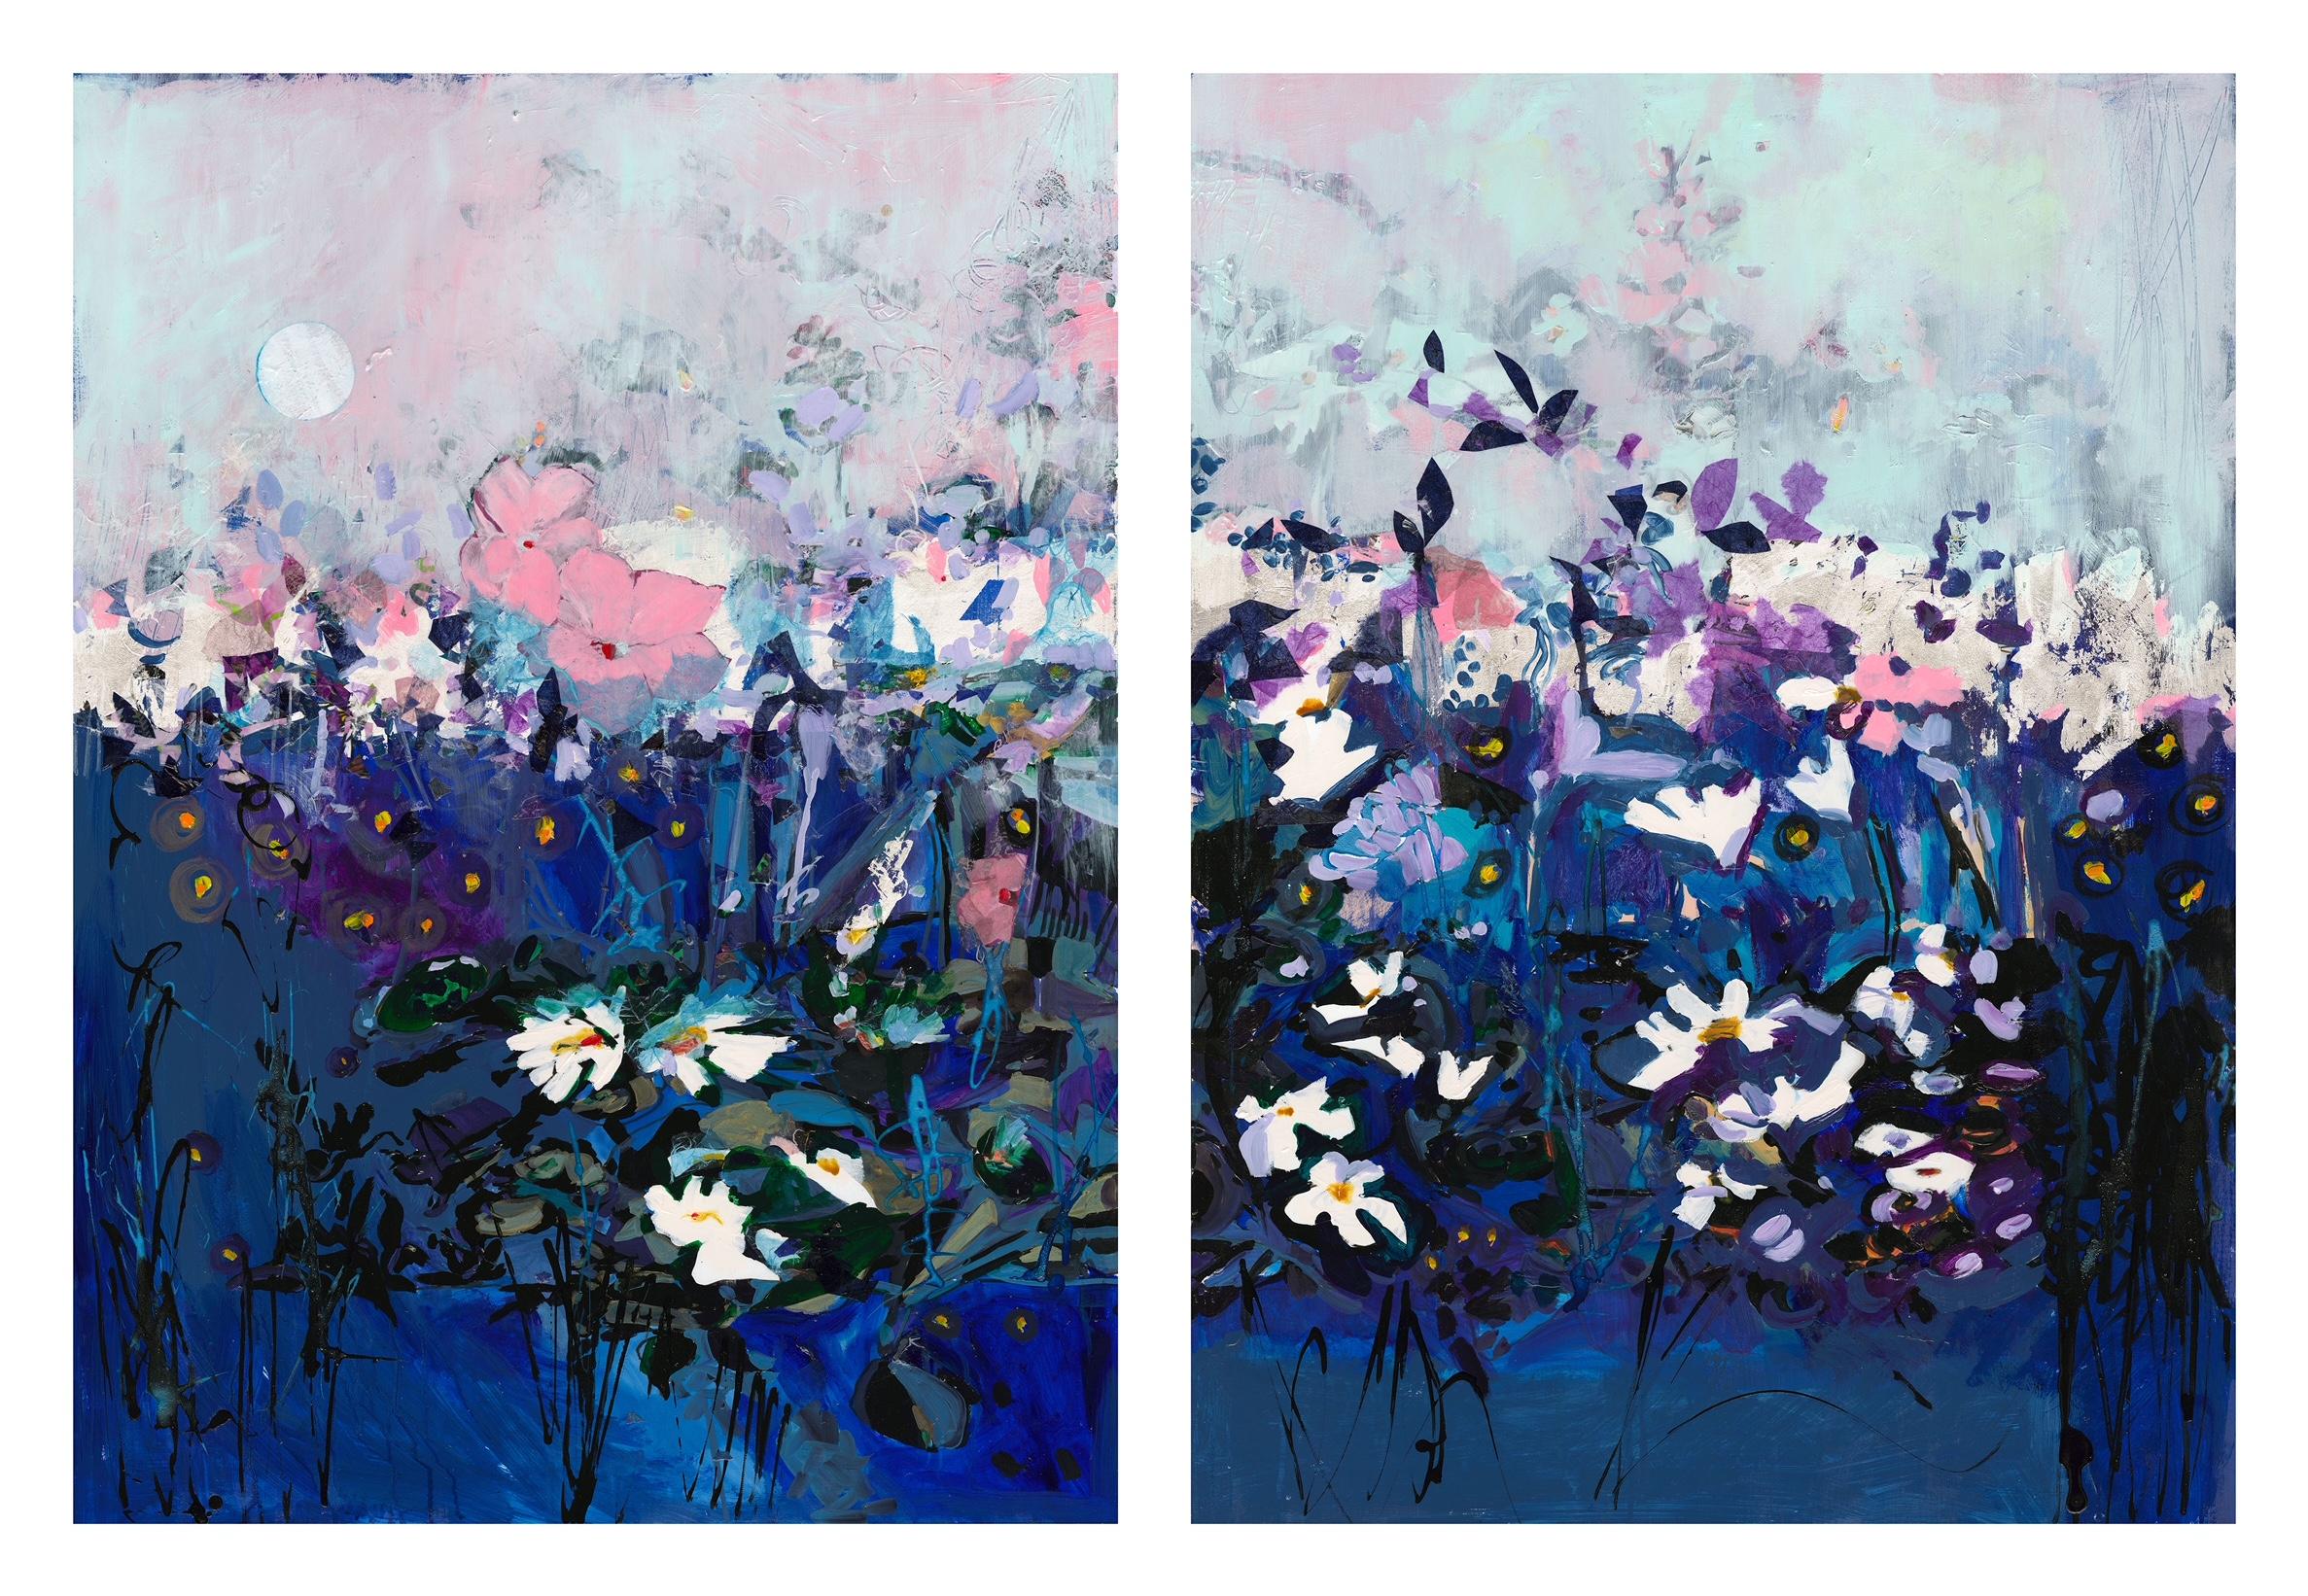 Moonlight & Fireflies on 2 panels